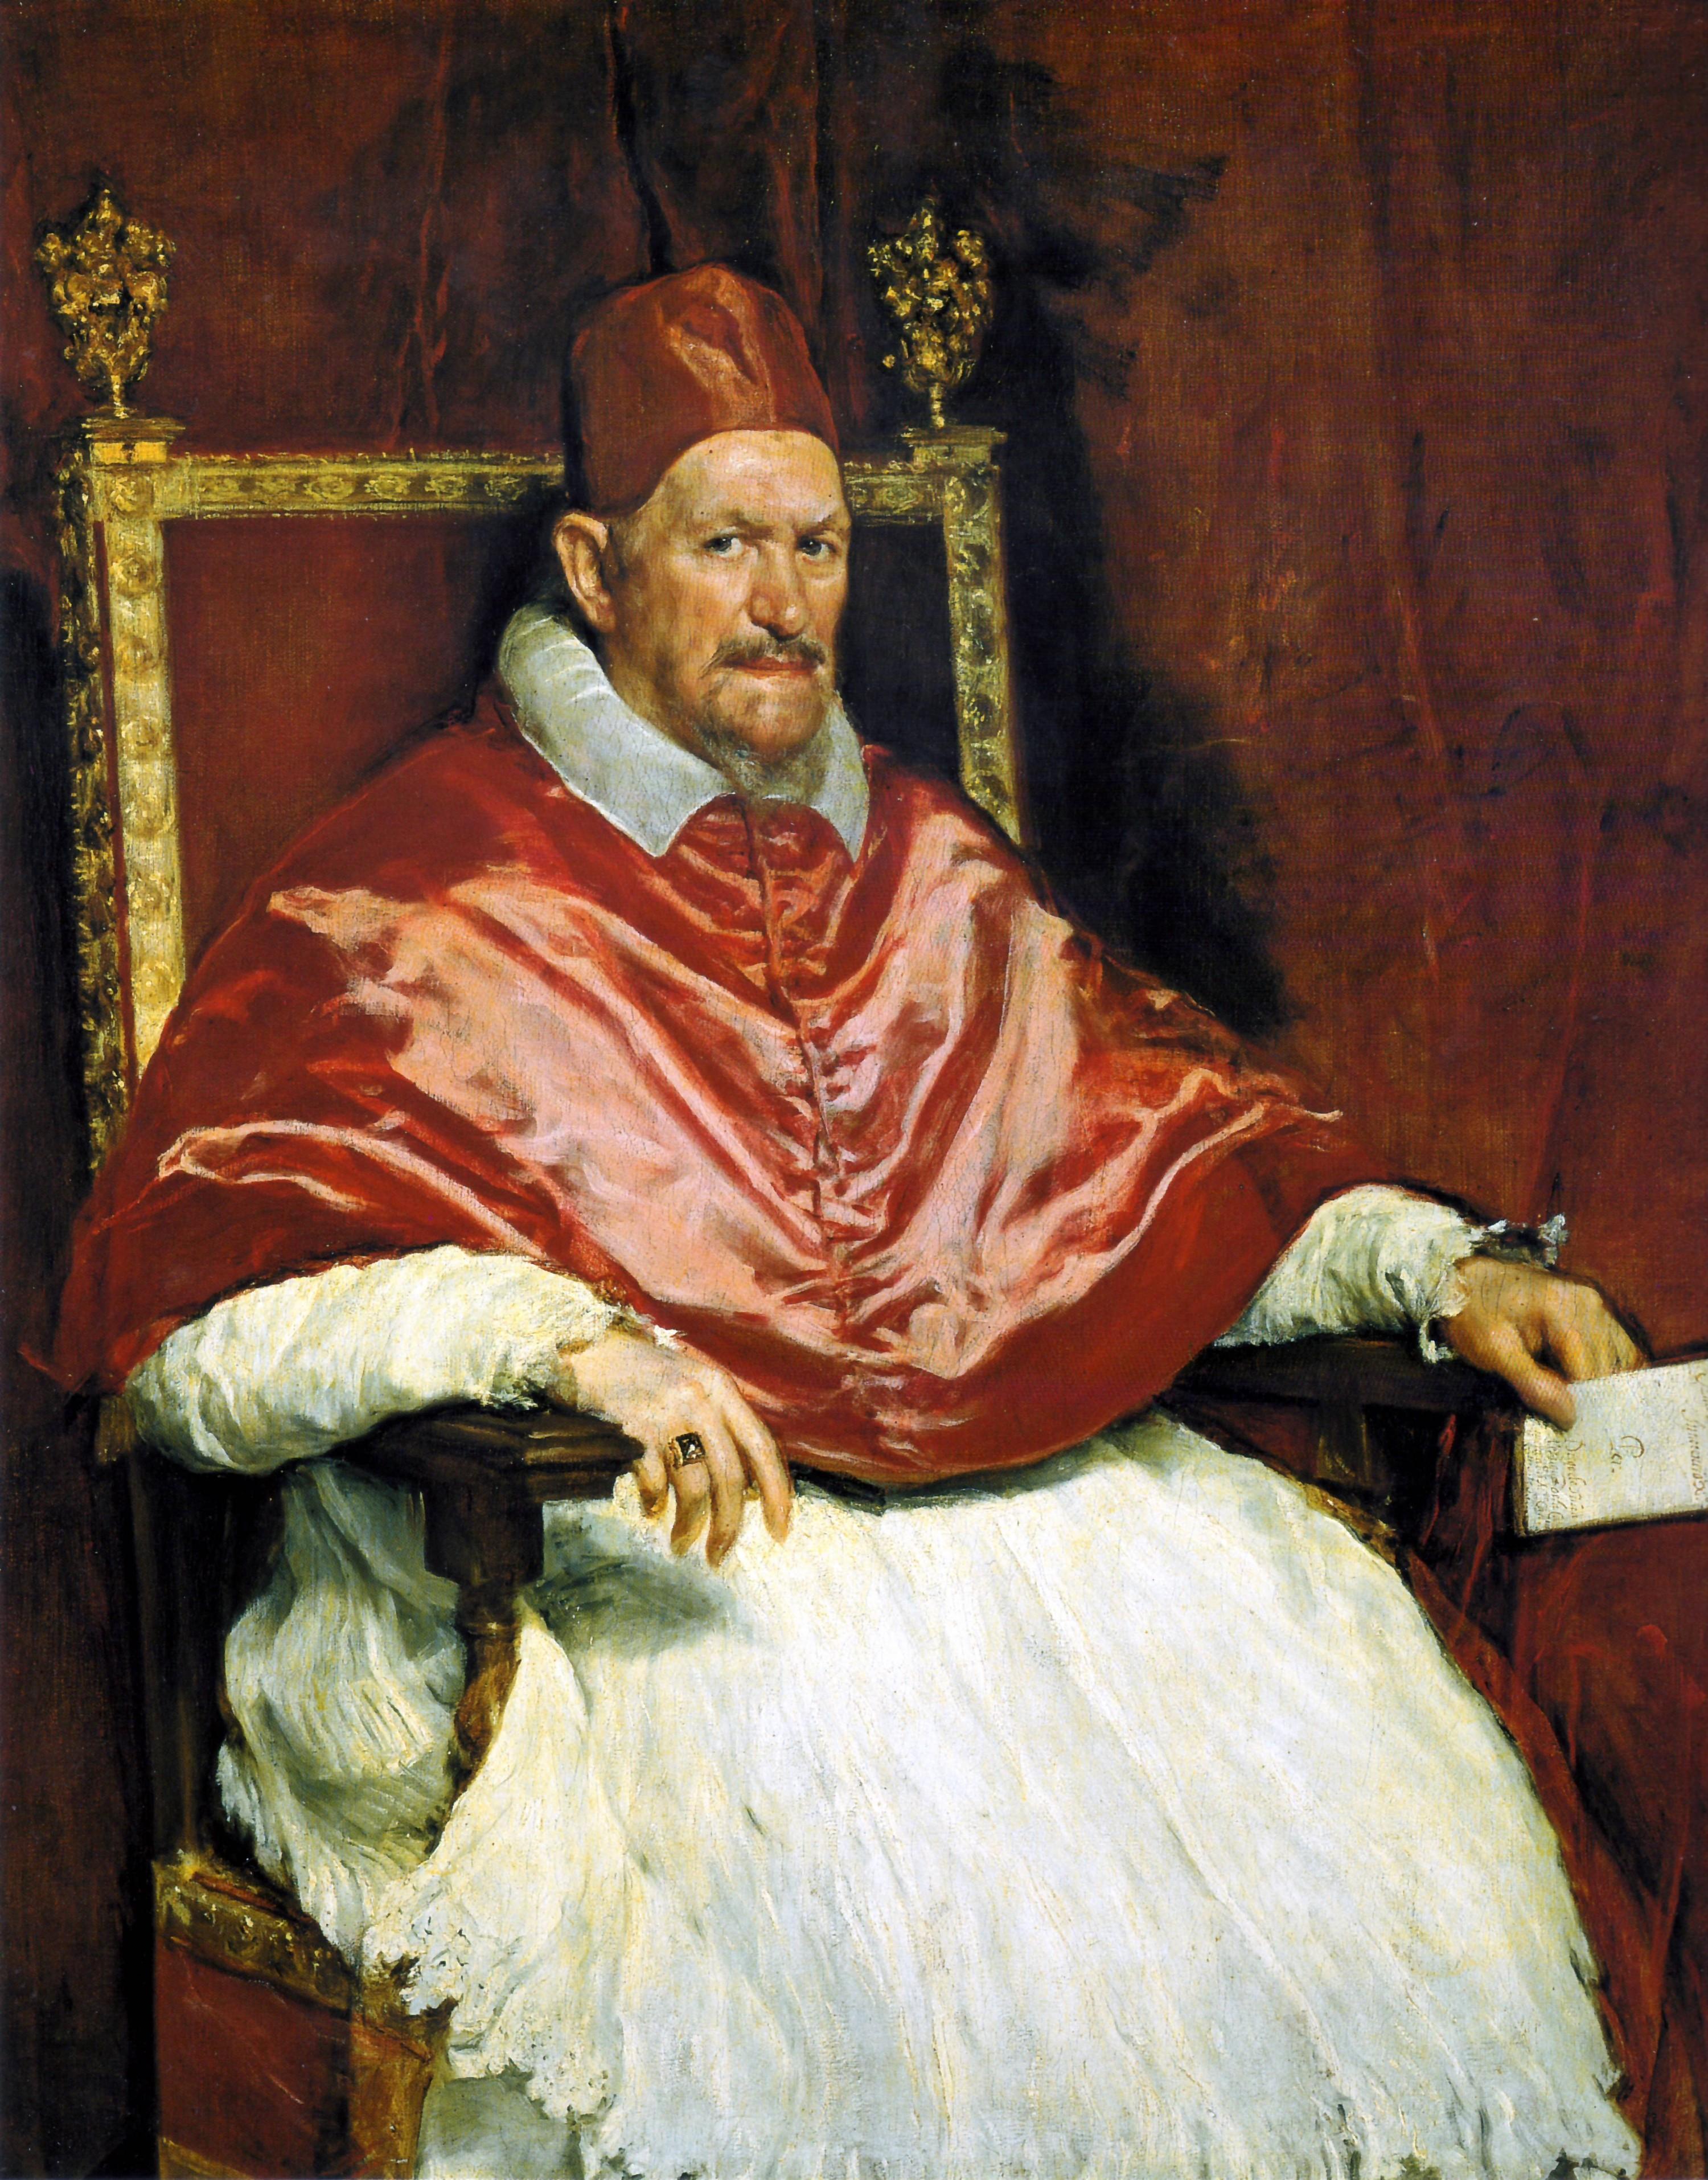 Pope Innocent X, Diego Velázquez, 1650.